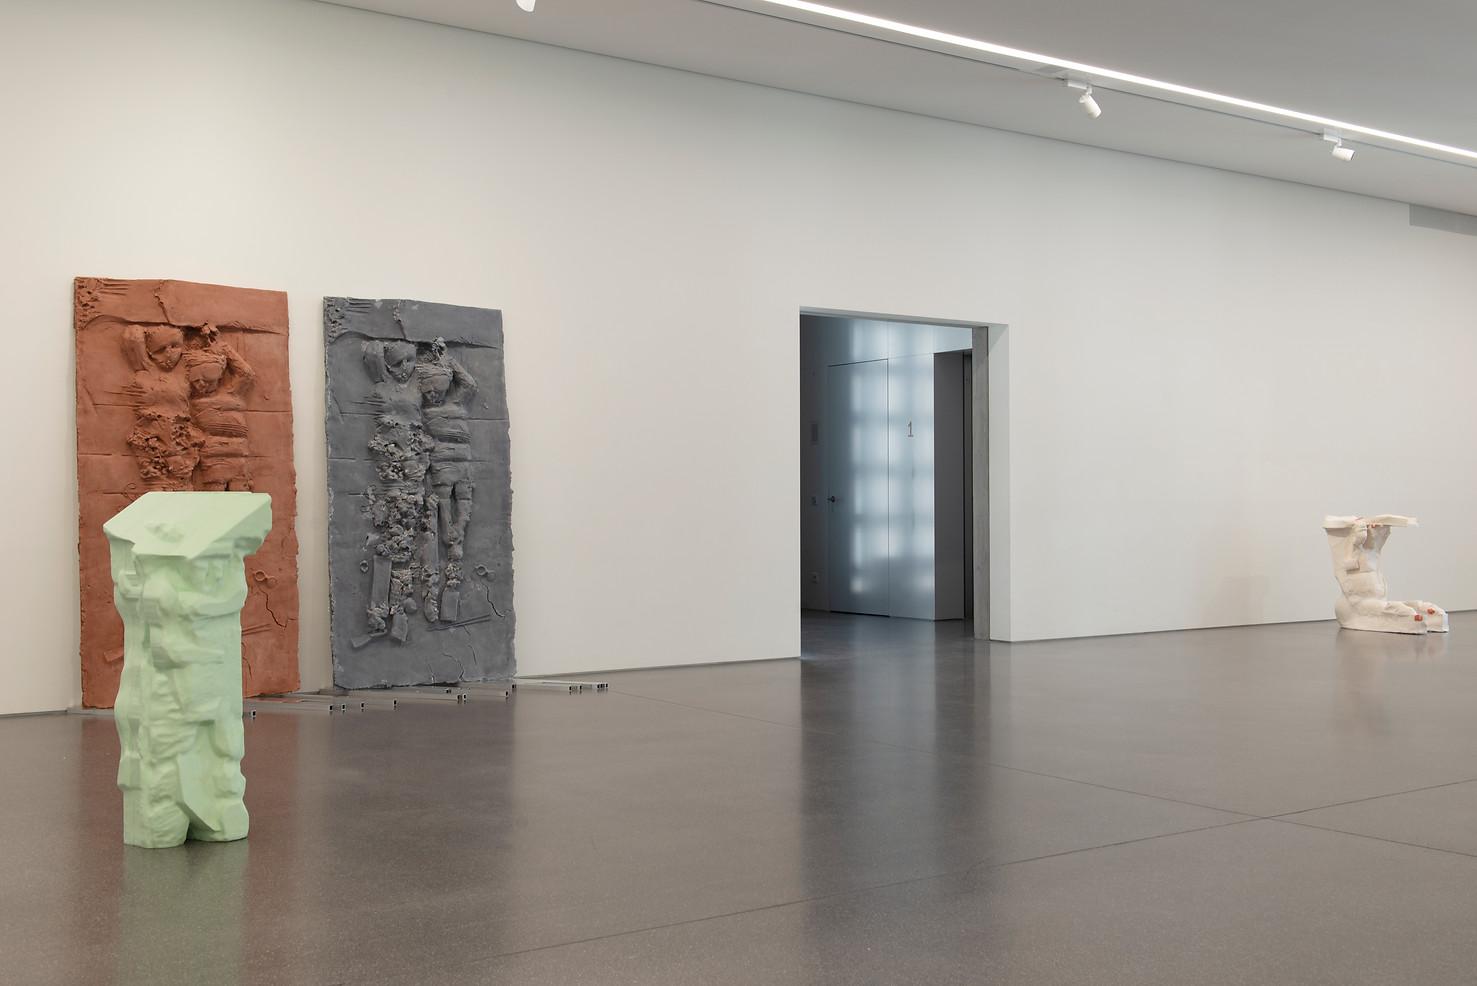 Die Telamonen, 2020  Installation view at Bündner Kunstmuseum, Chur, Switzerland Photo©Thomas Strub